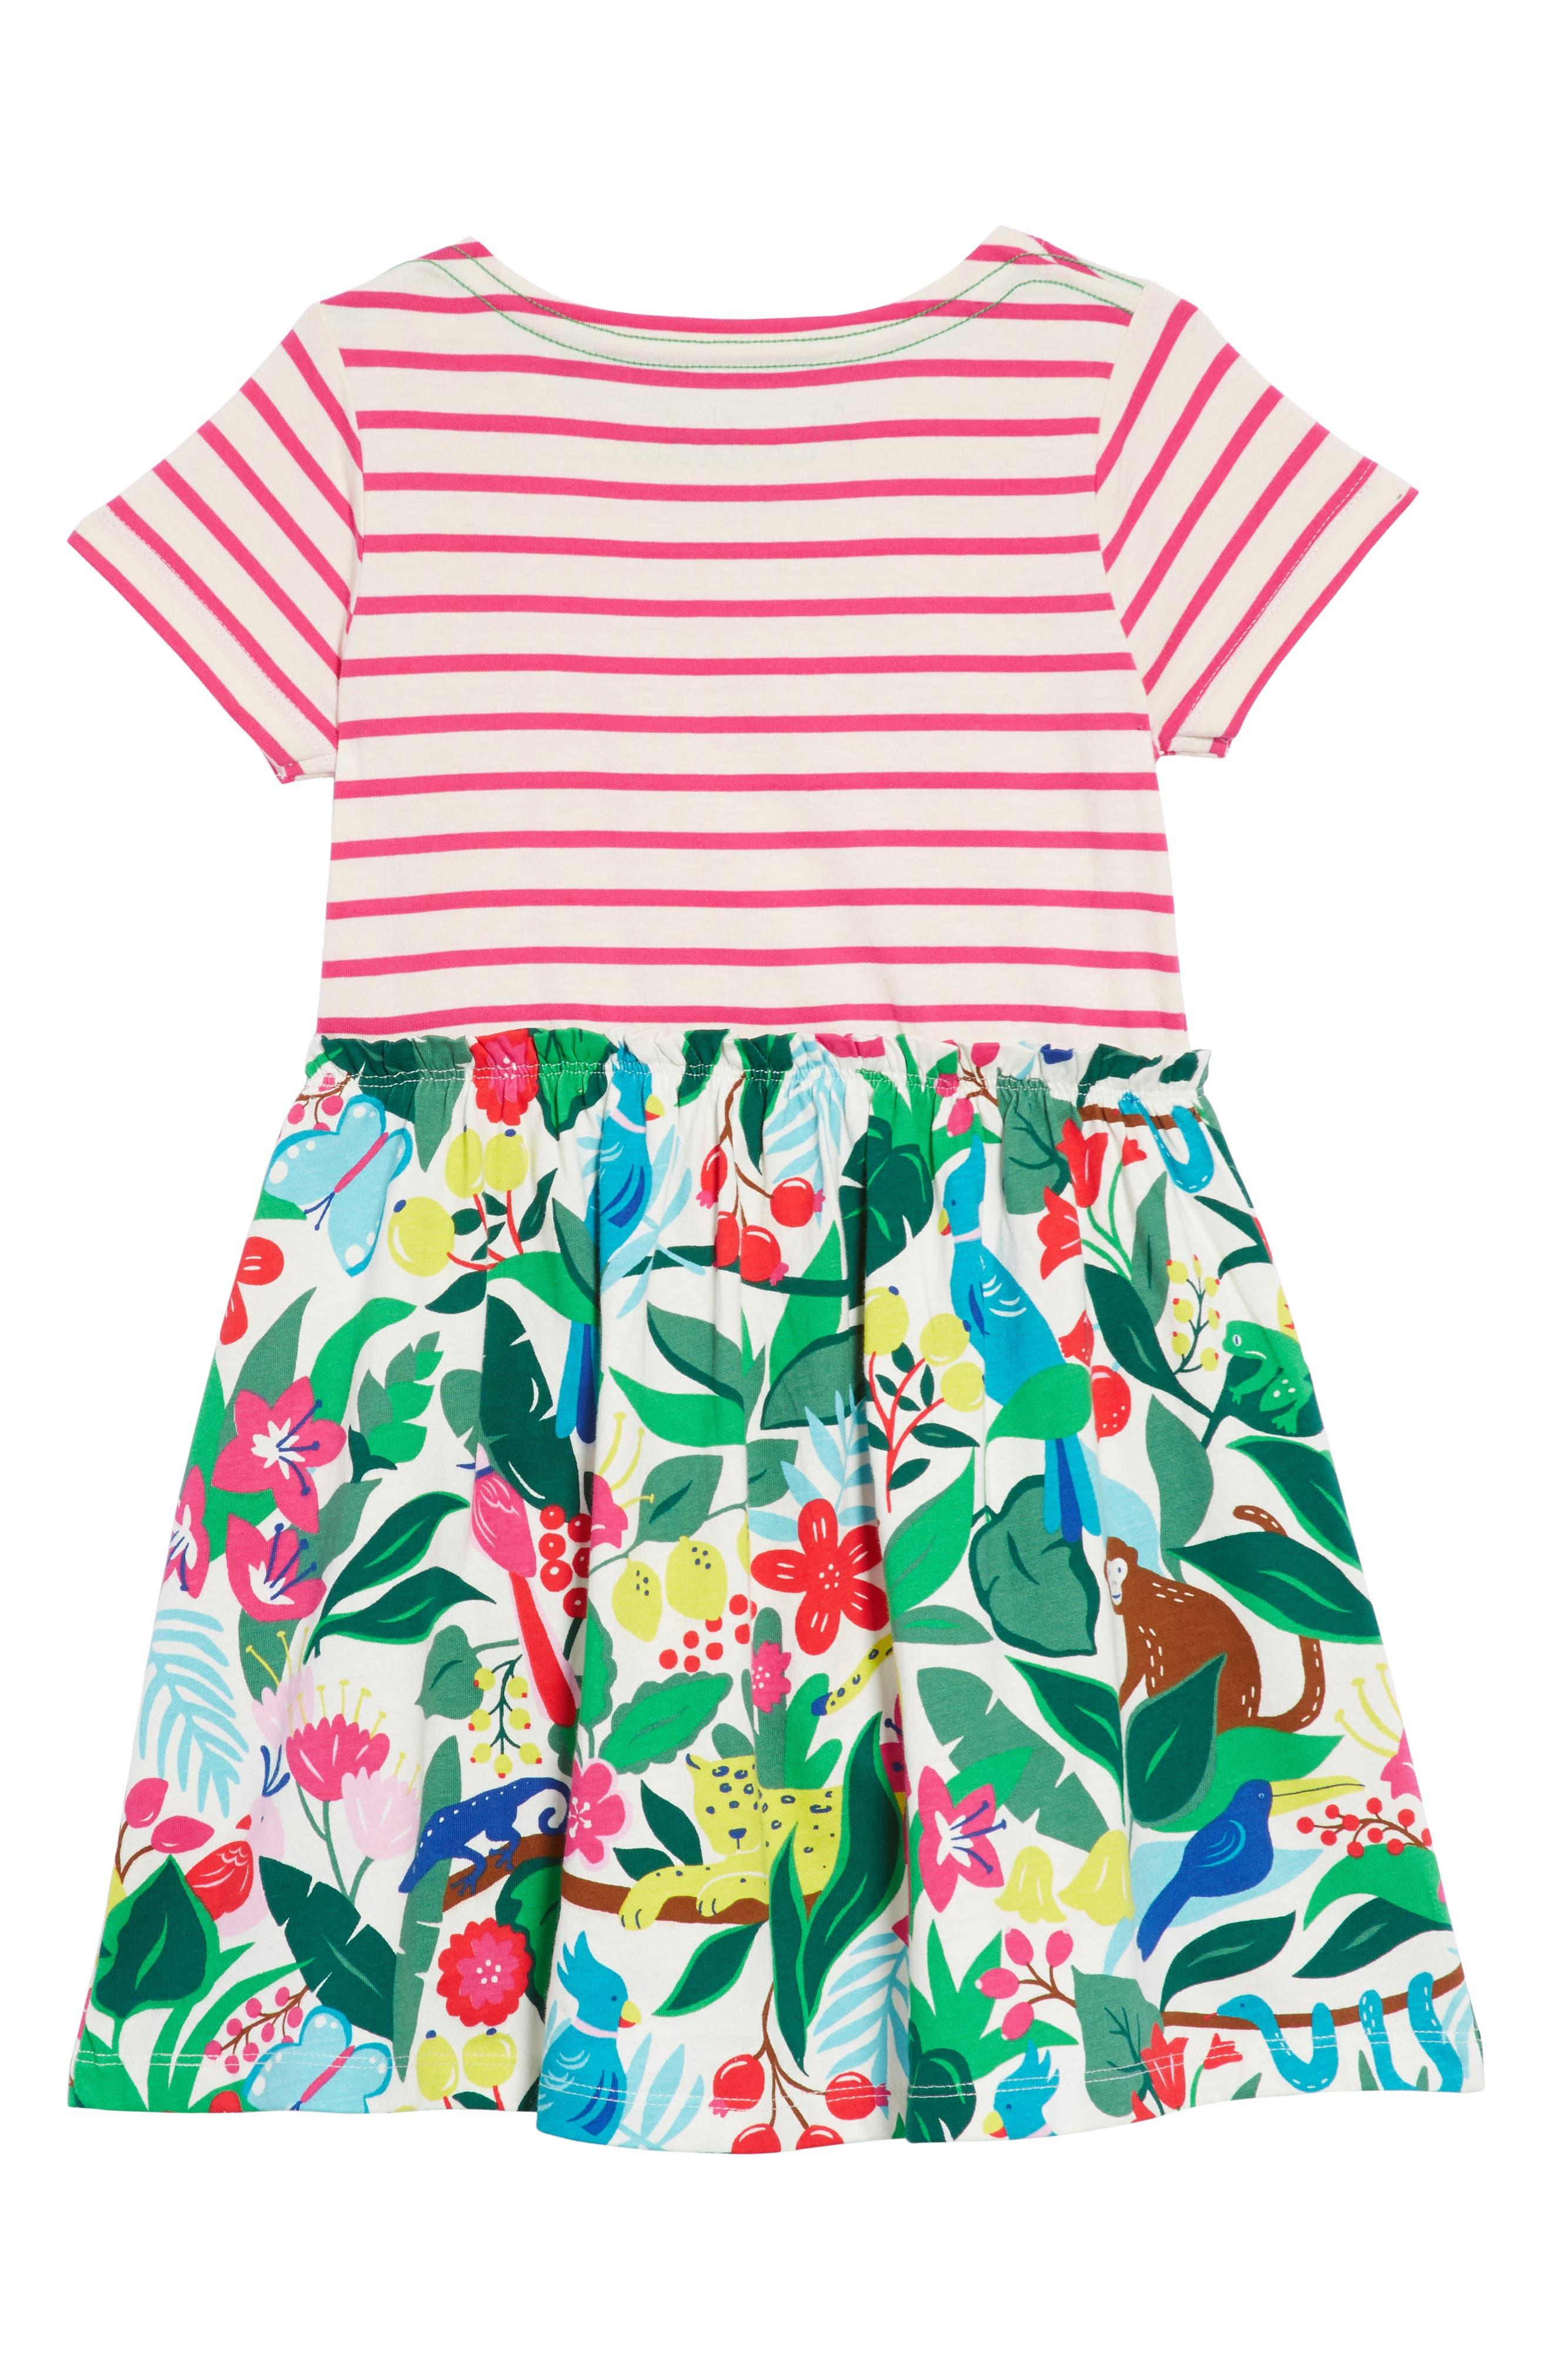 MINI BODEN,                             Bright Hotchpotch Jersey Dress,                             Alternate thumbnail 2, color,                             901